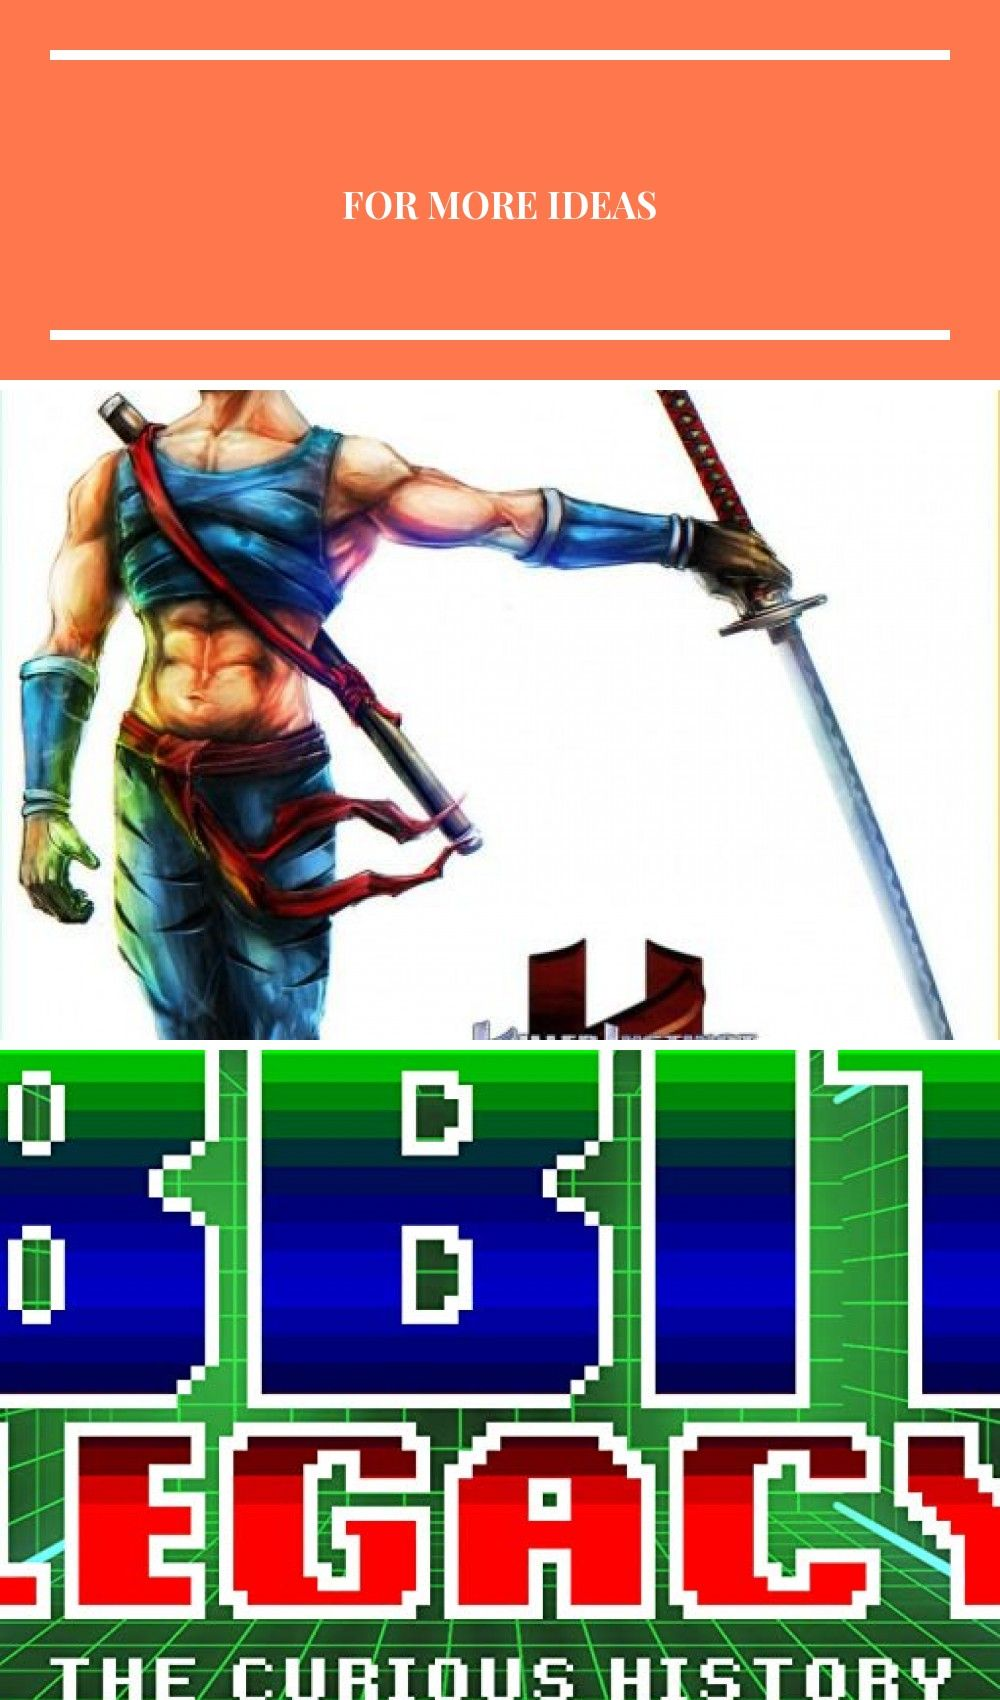 JAGO by AGA99 on deviantART video game genre